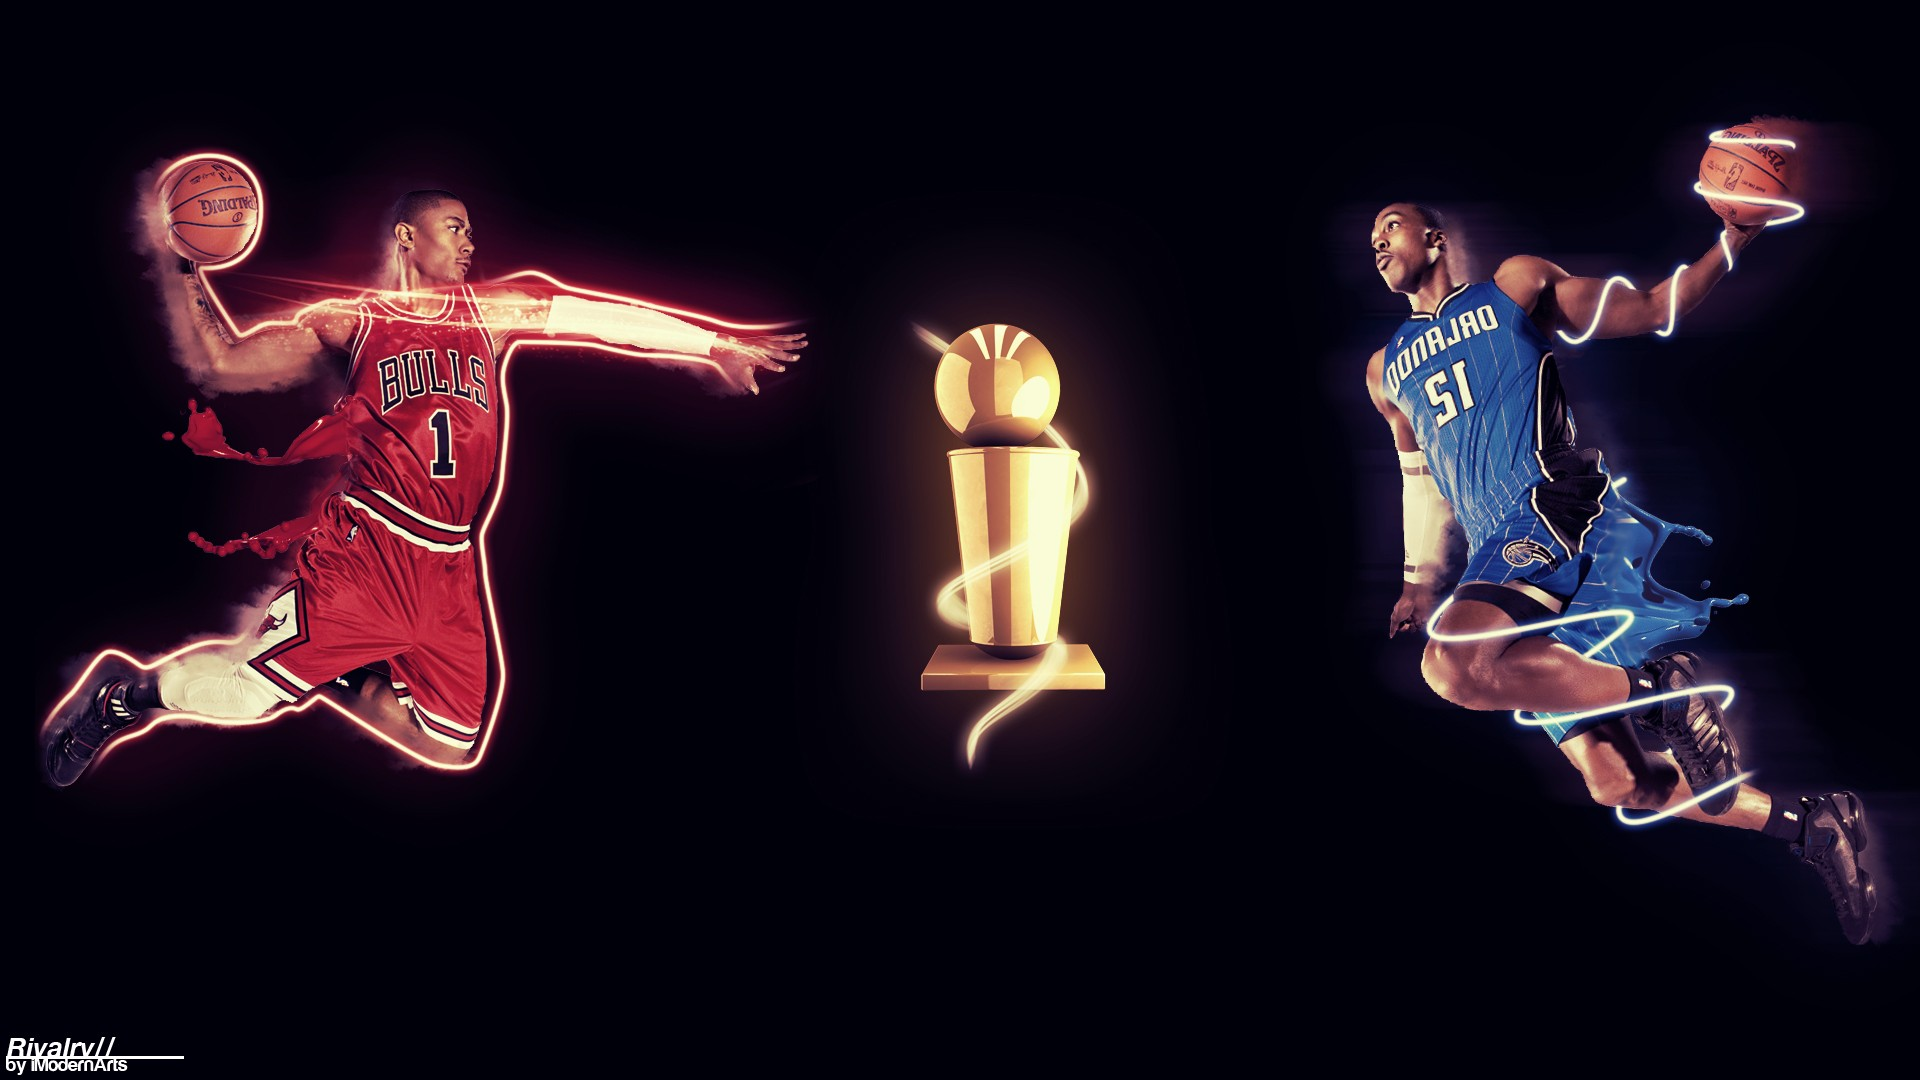 NBA Basketball Wallpaper 1920x1080 NBA Basketball Chicago Bulls 1920x1080